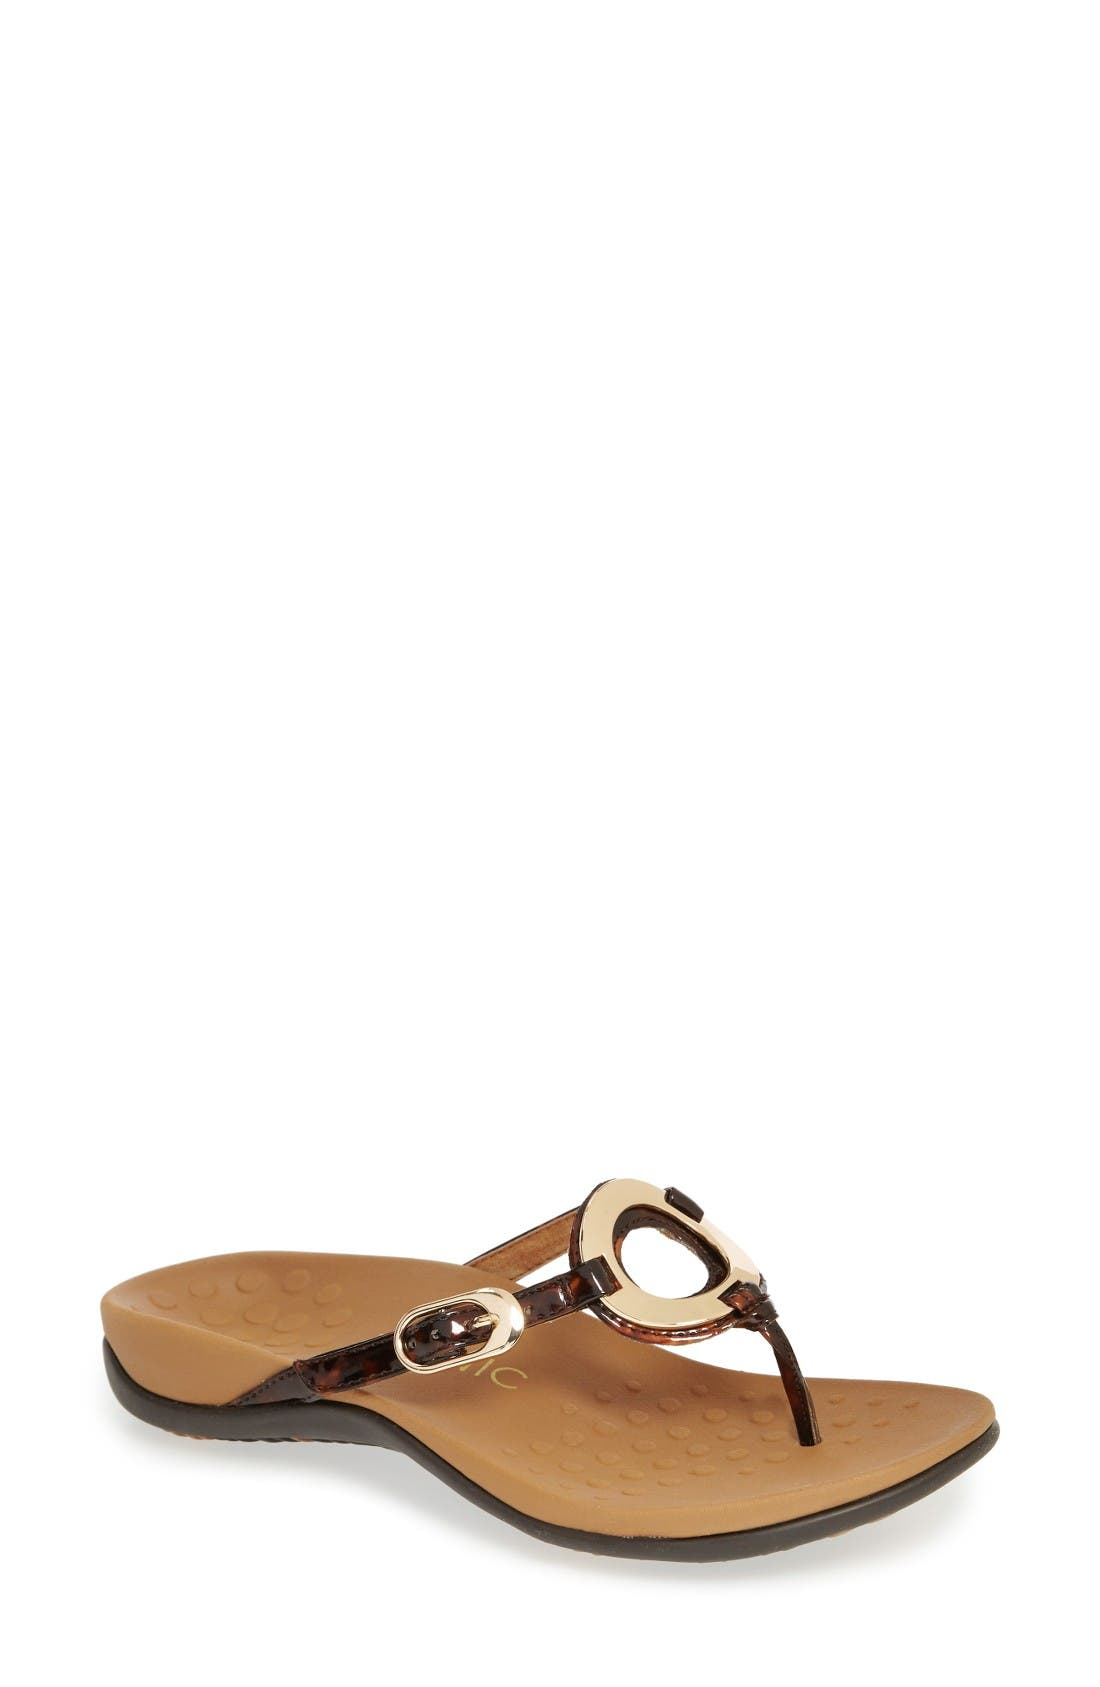 VIONIC 'Karina' Sandal